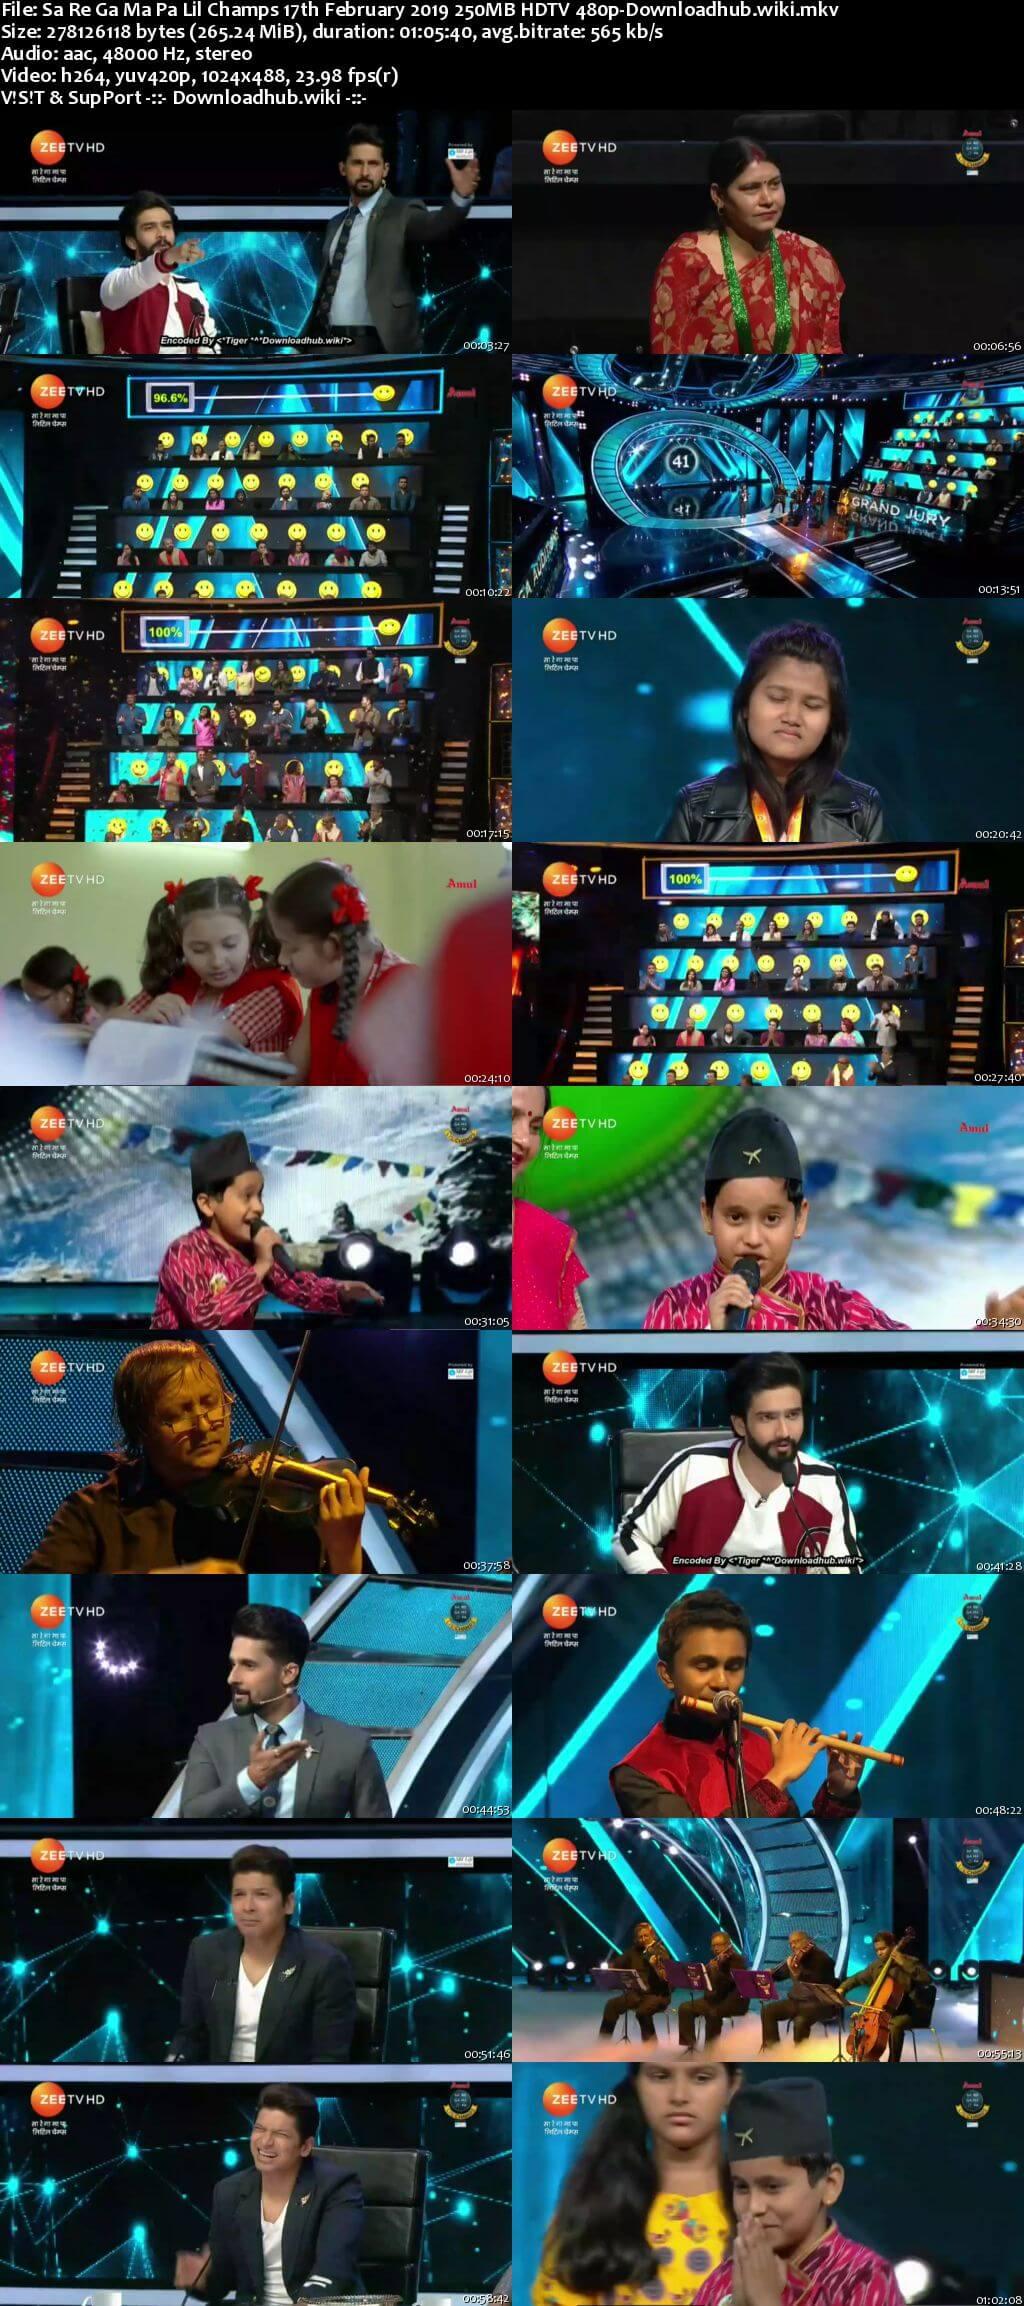 Sa Re Ga Ma Pa Lil Champs 17 February 2019 Episode 04 HDTV 480p